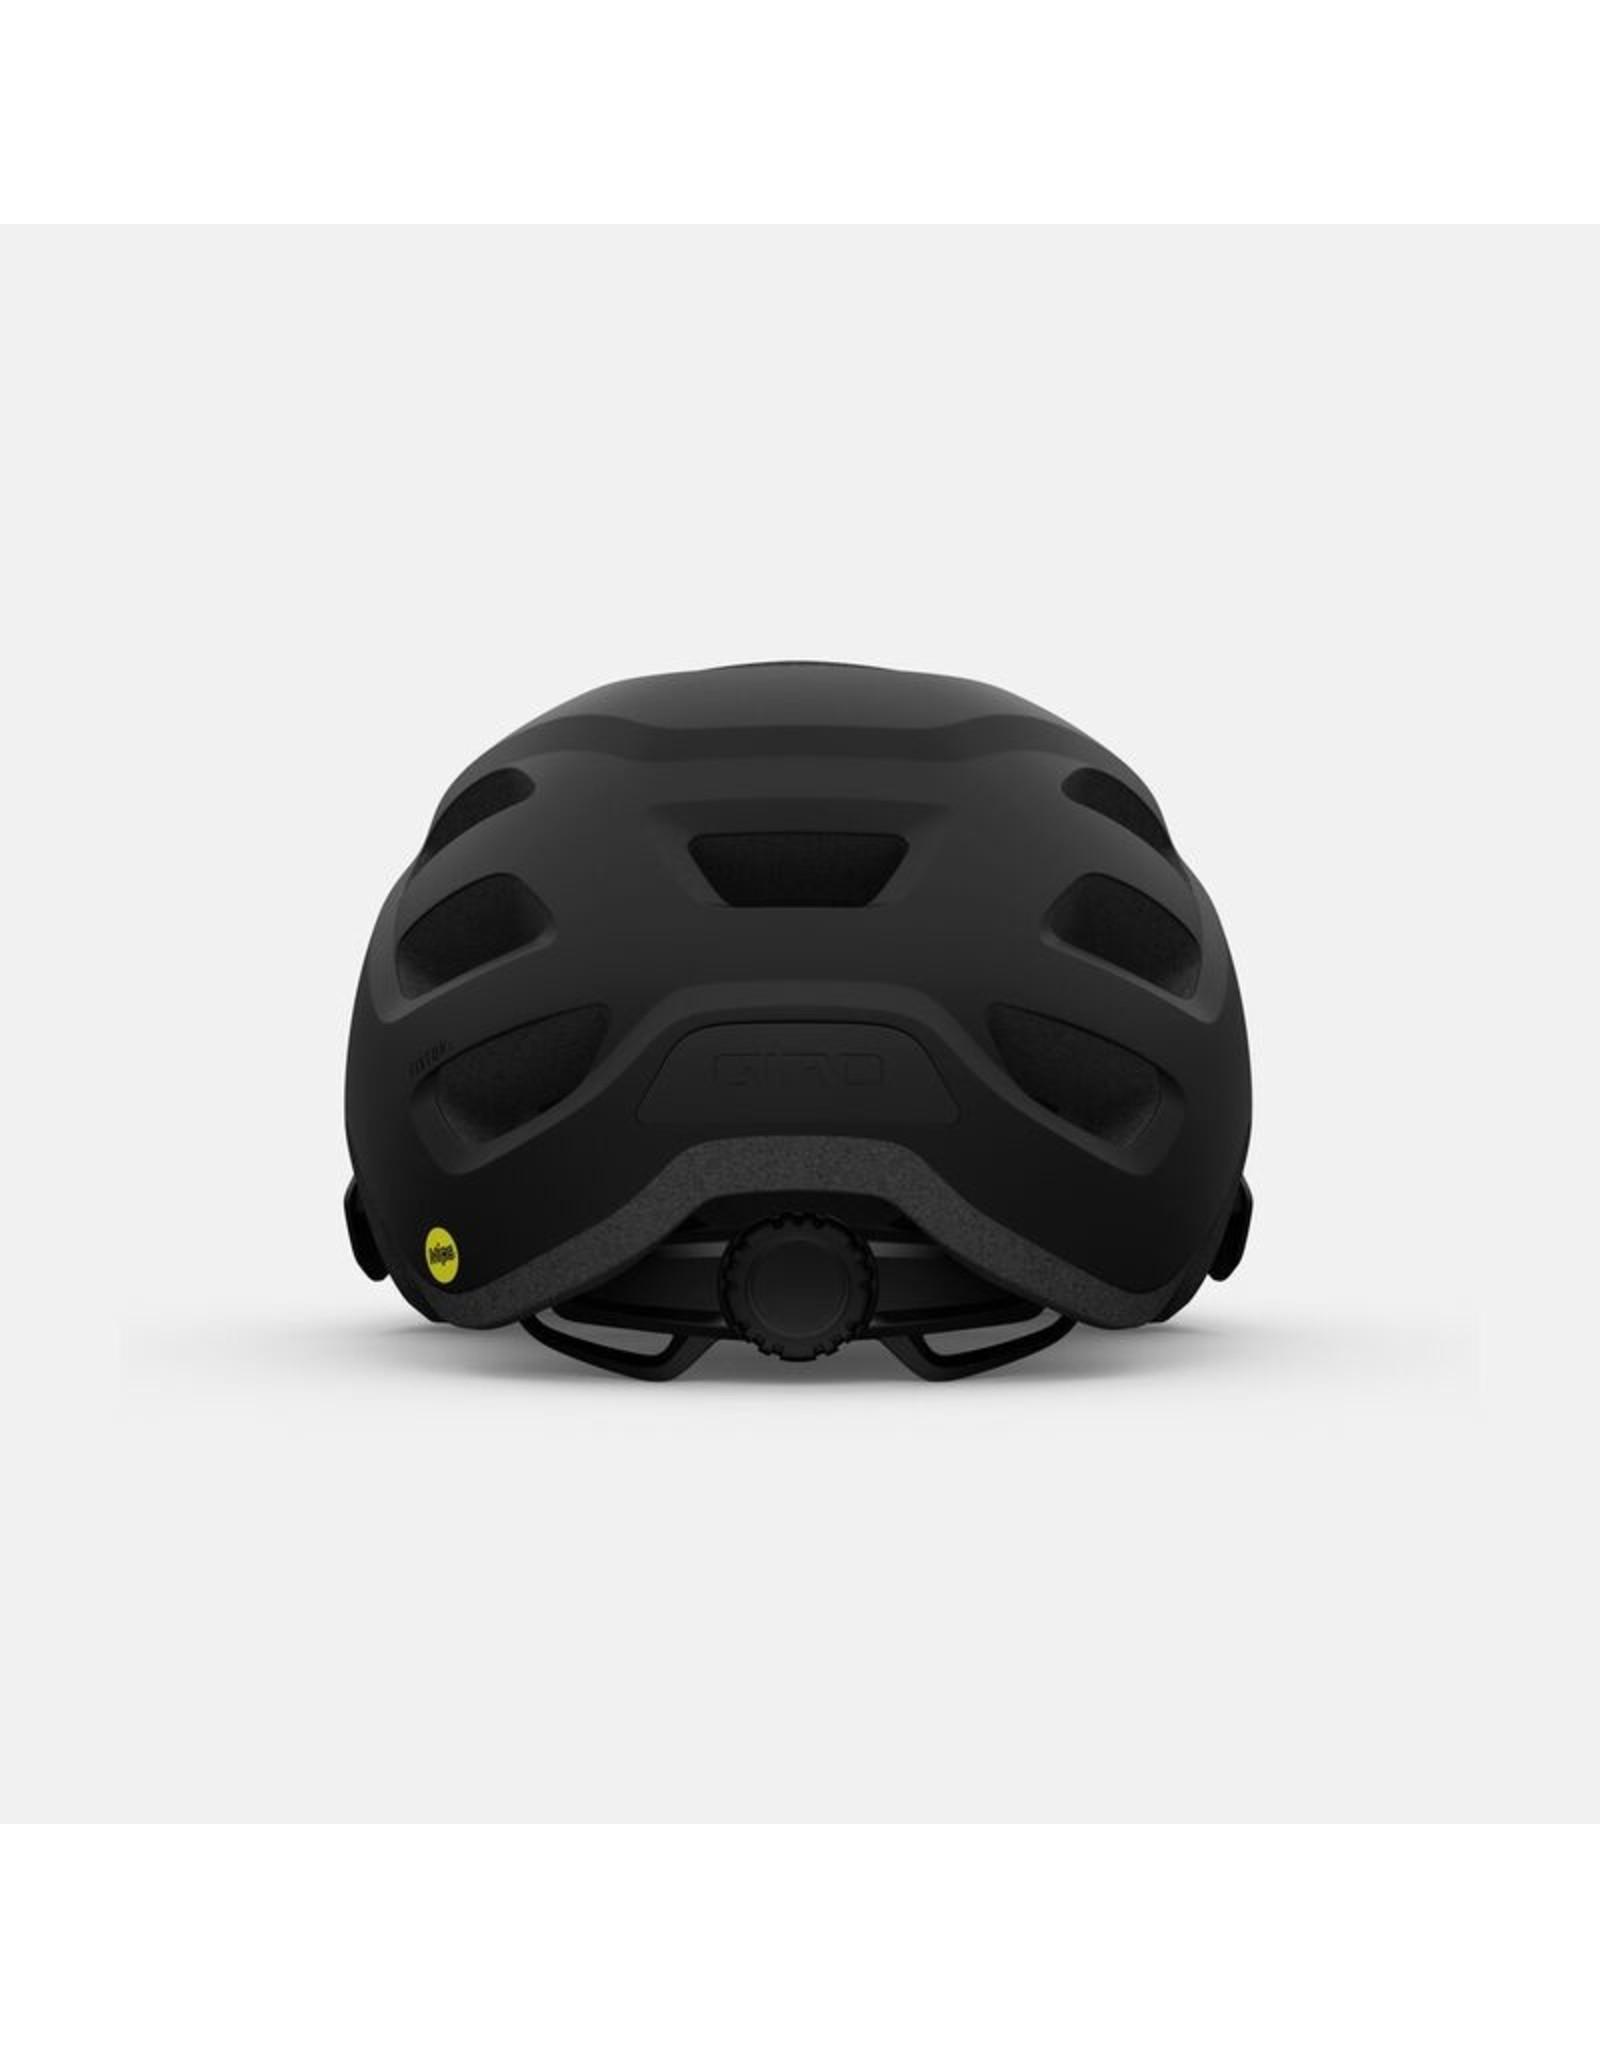 Giro Cycling Giro Fixture MIPS XL Helmet, Matte Black, Universal XL Adult